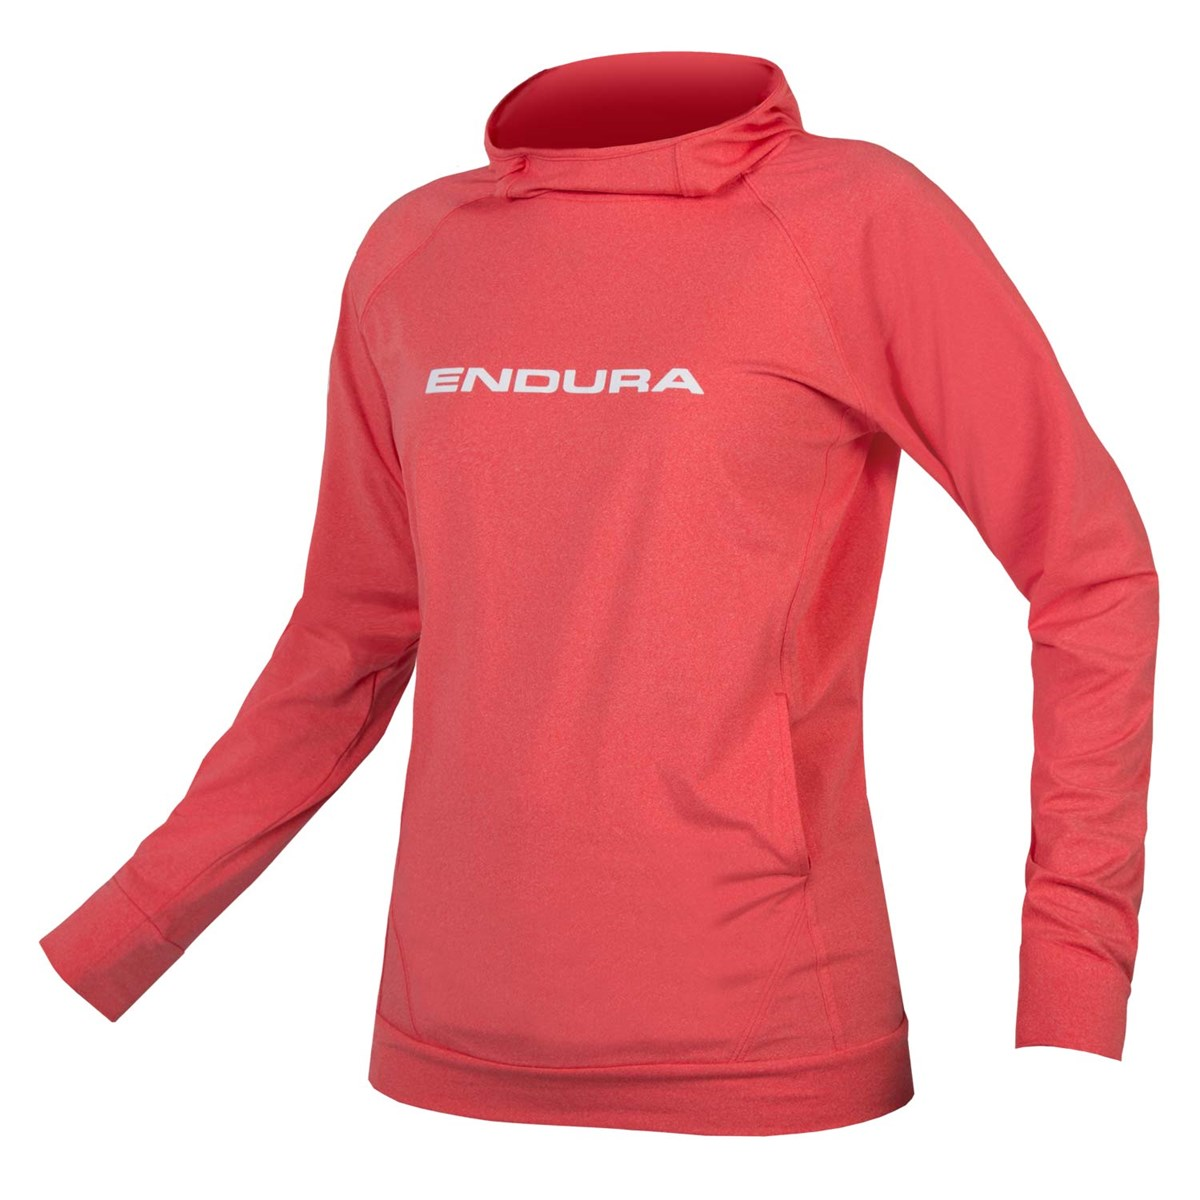 4c3e4e7c0 Endura SingleTrack Womens Hoodie Coral £49.99